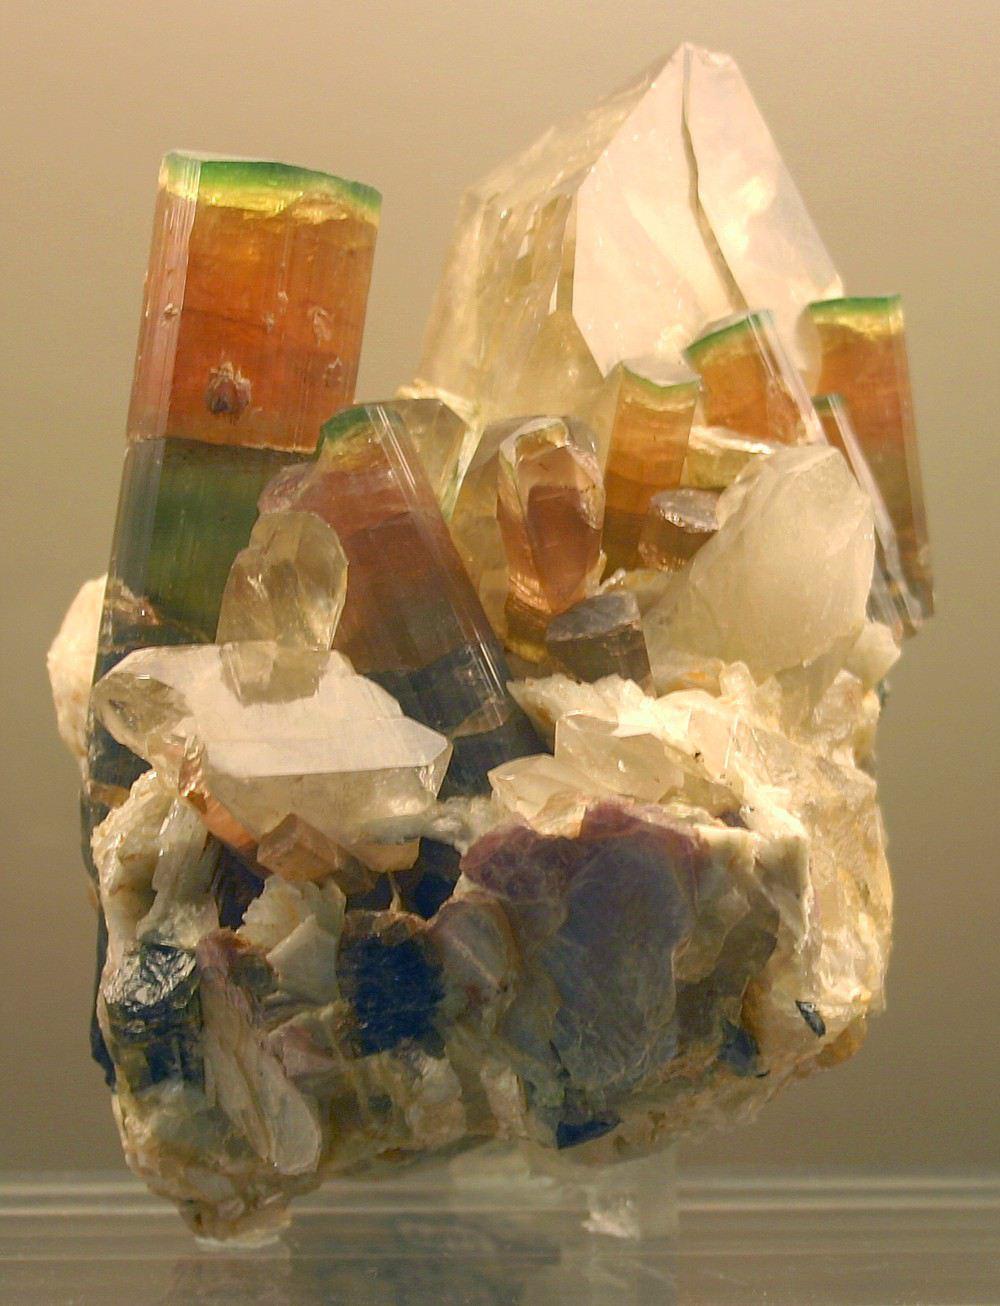 Tourmaline Crystals with Quartz